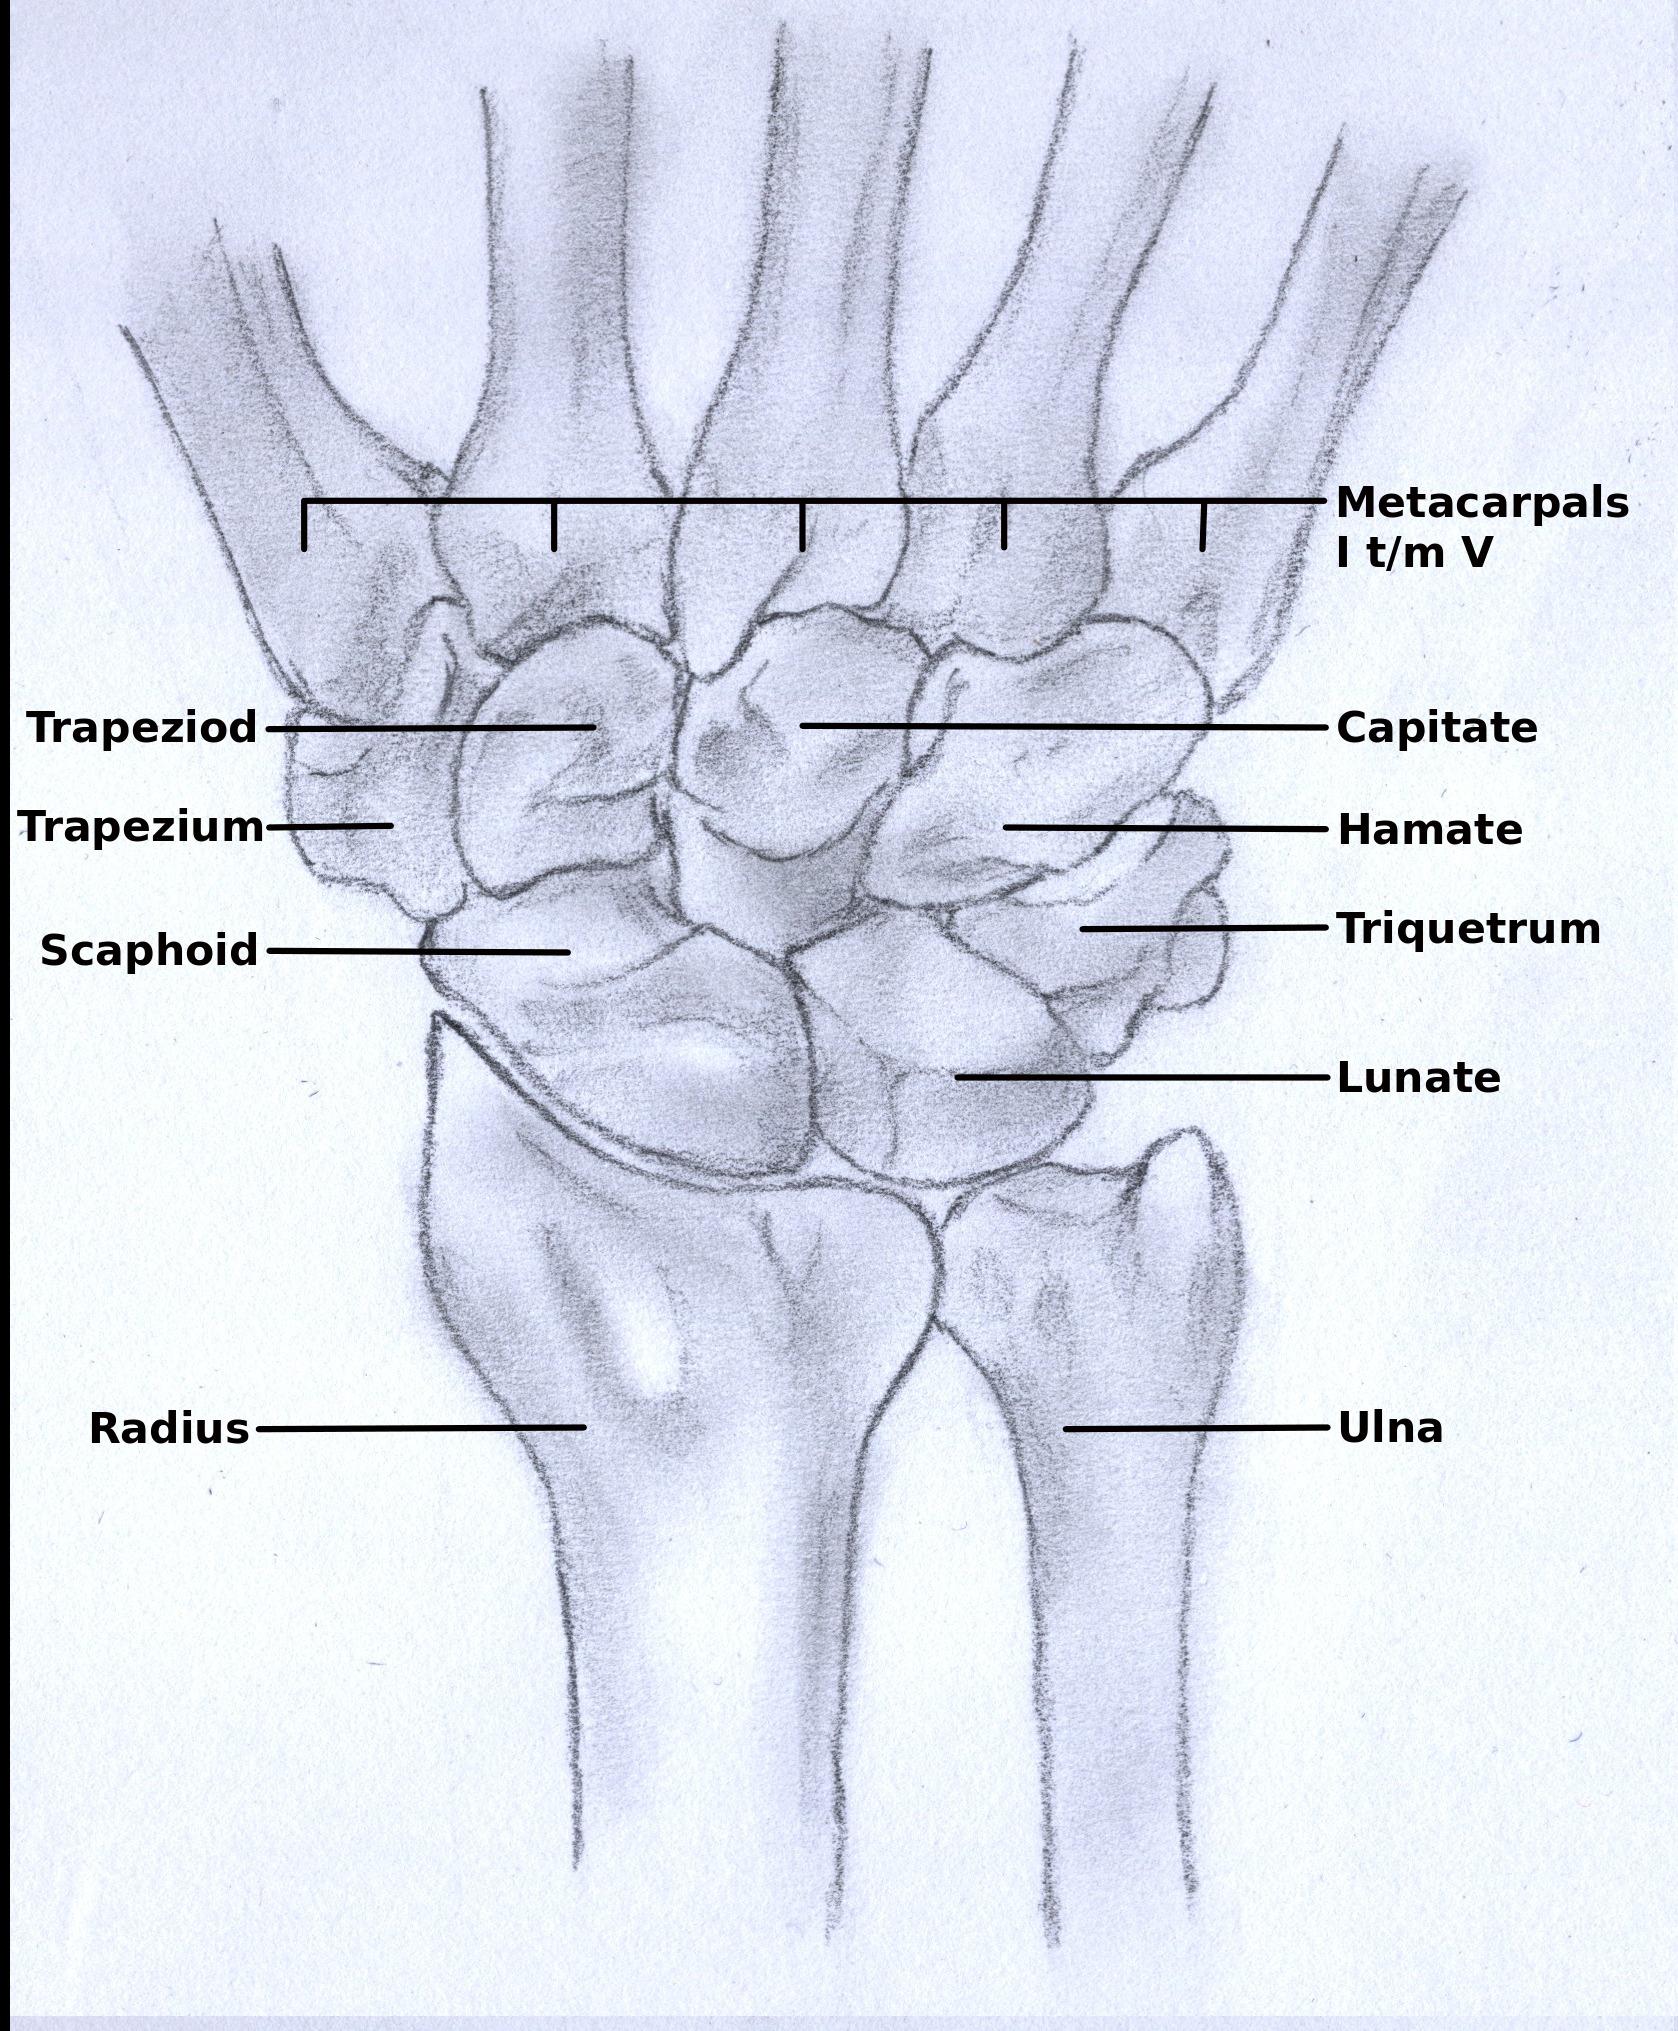 File:Wrist anatomy.jpg - Wikimedia Commons